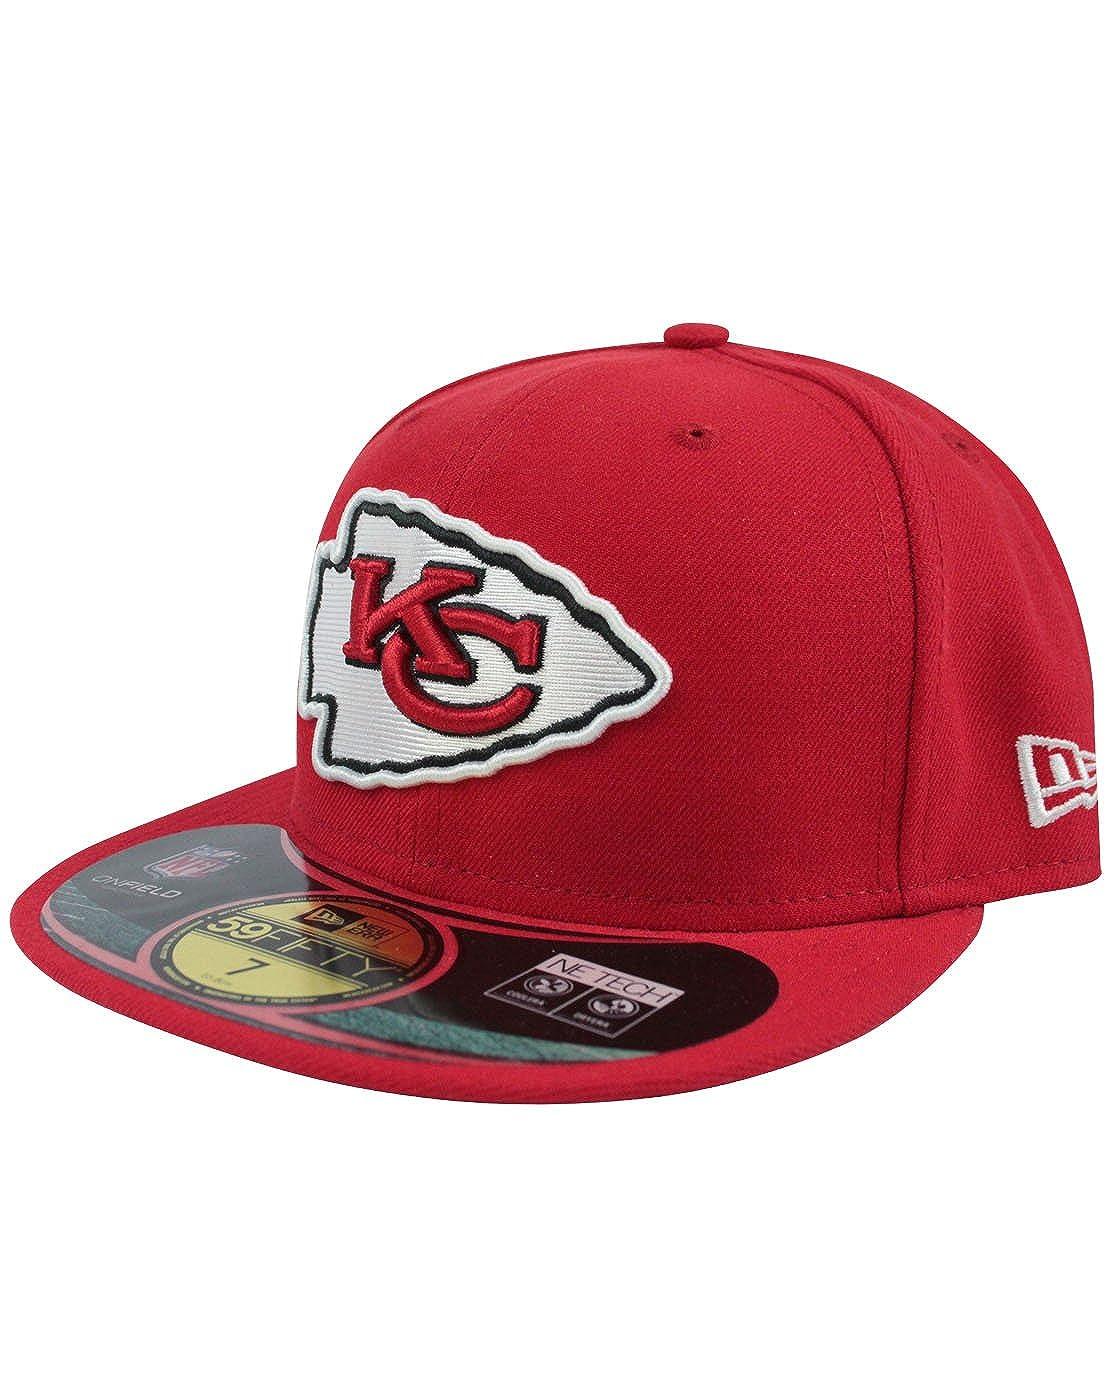 20ea1edec43 Amazon.com  New Era 59Fifty NFL Kansas City Chiefs Cap  Clothing